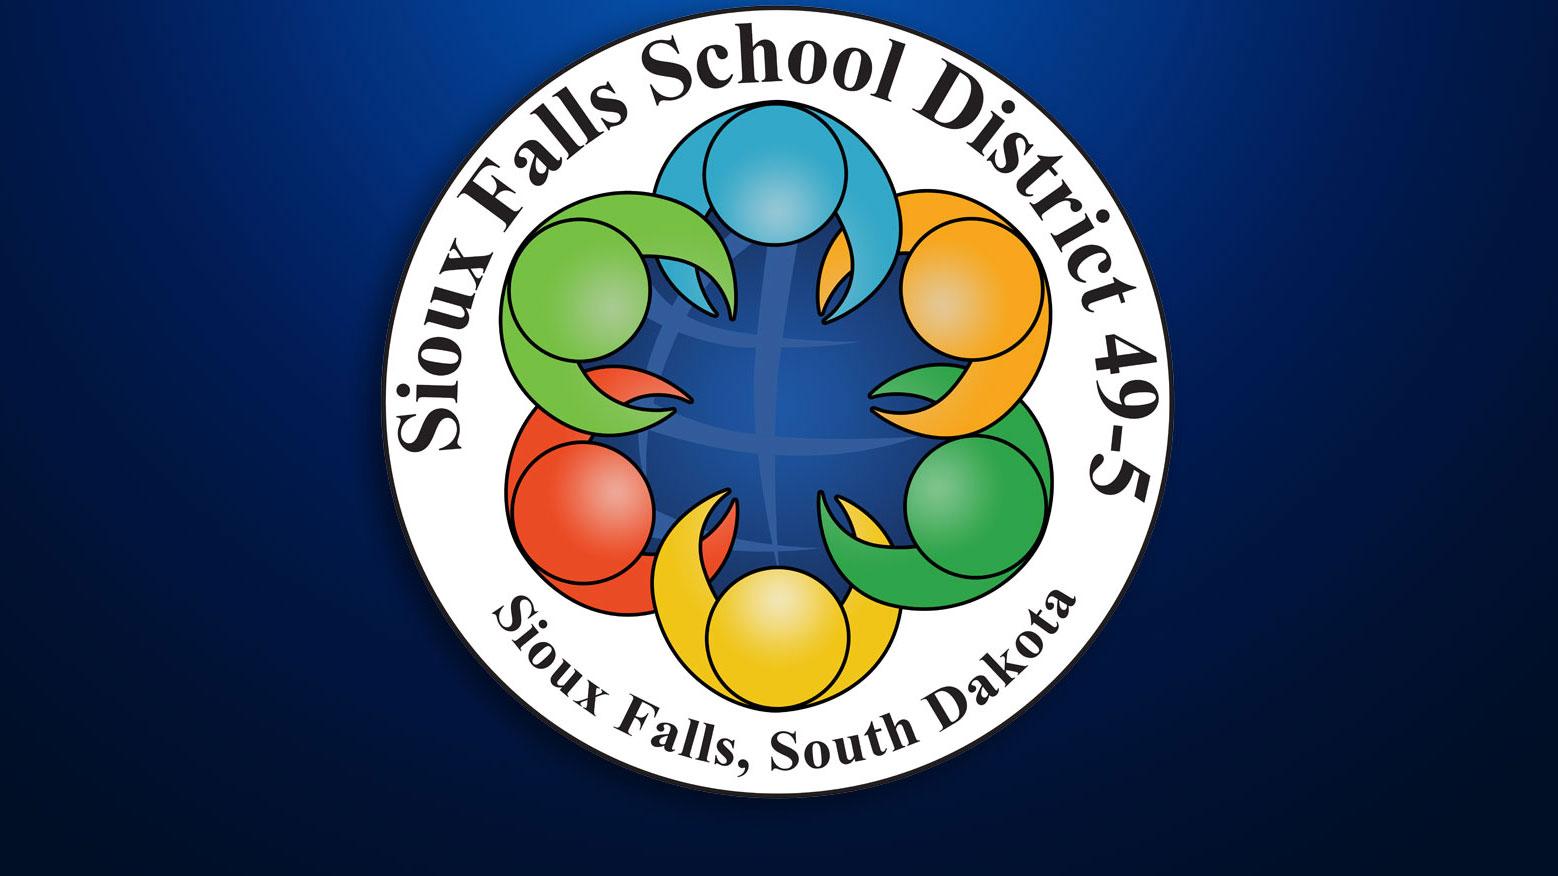 KELO-Sioux-Falls-School-District_1531166779784.jpg